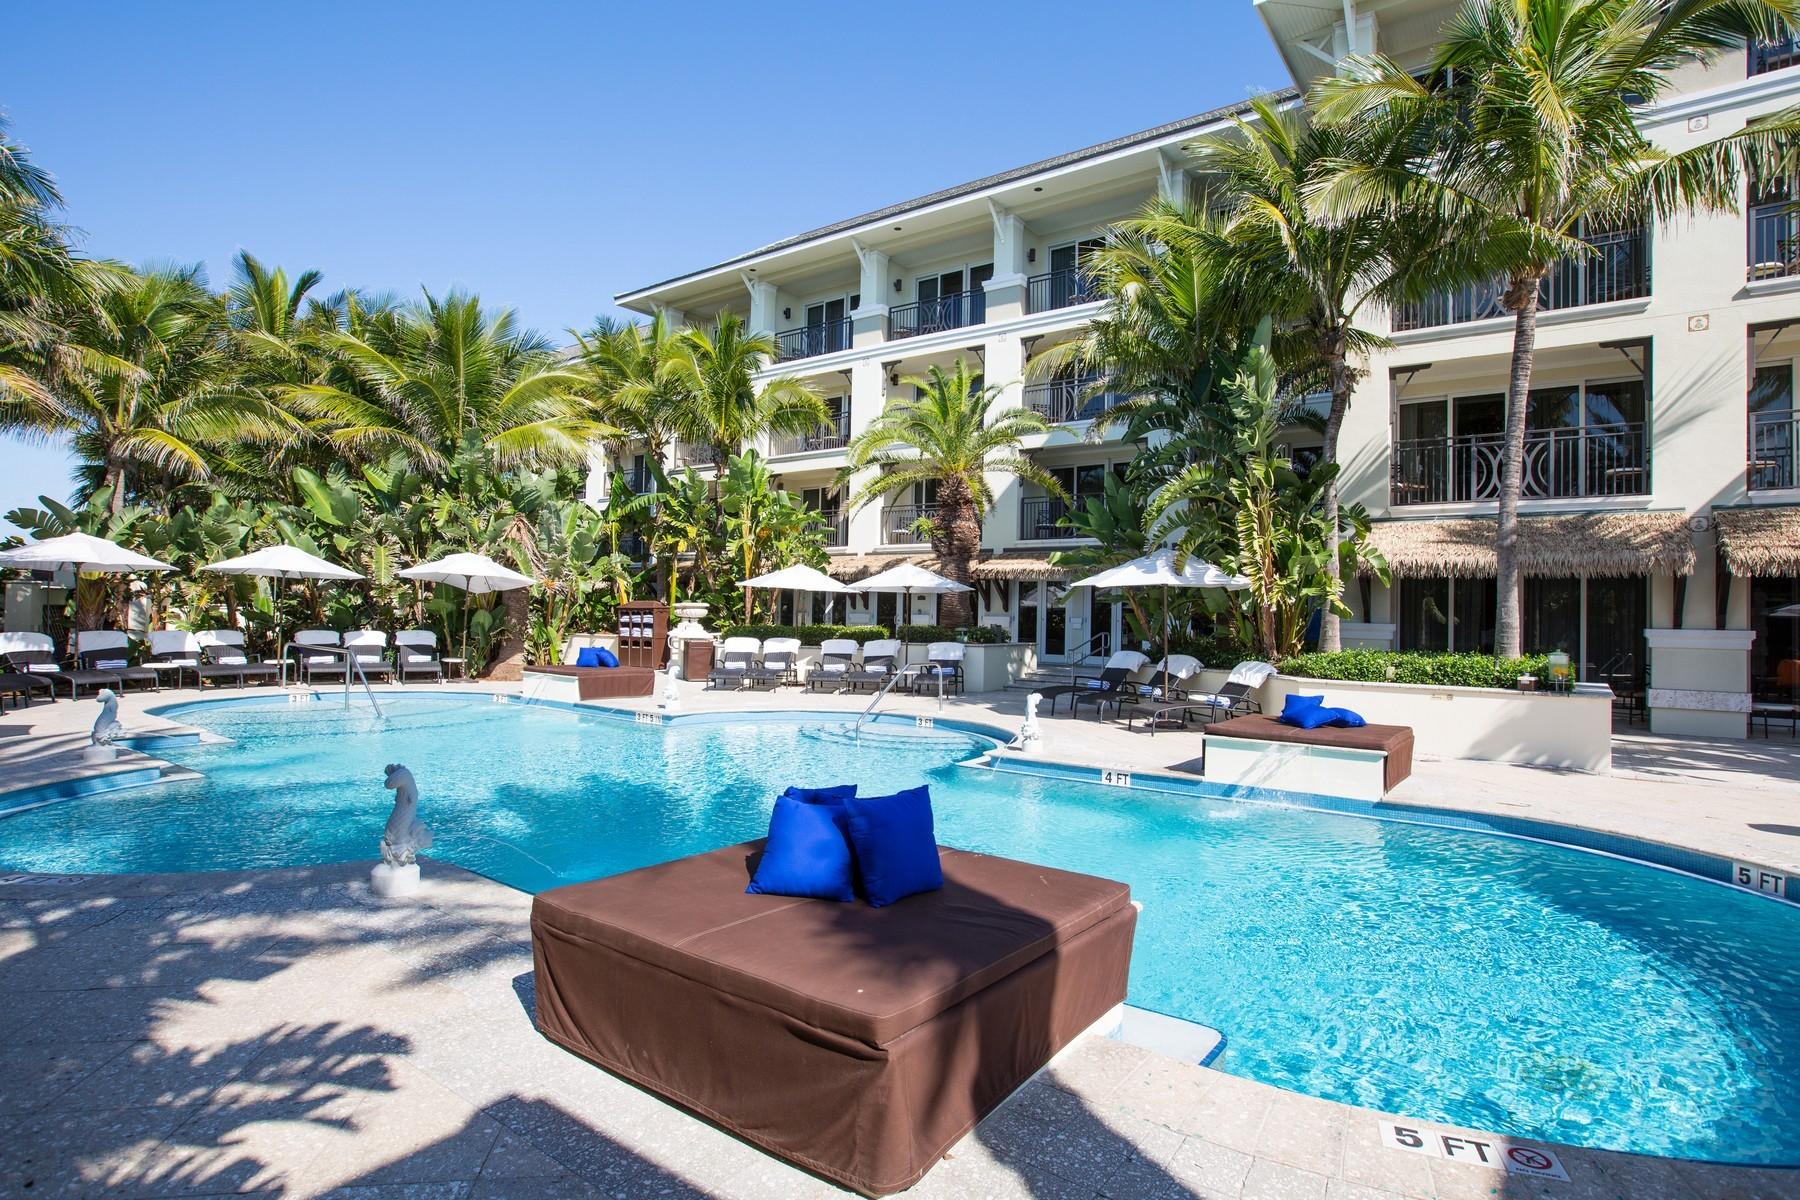 Condominiums for Sale at Vero Beach Condo Hotel 3500 Ocean Drive #407 Vero Beach, Florida 32963 United States